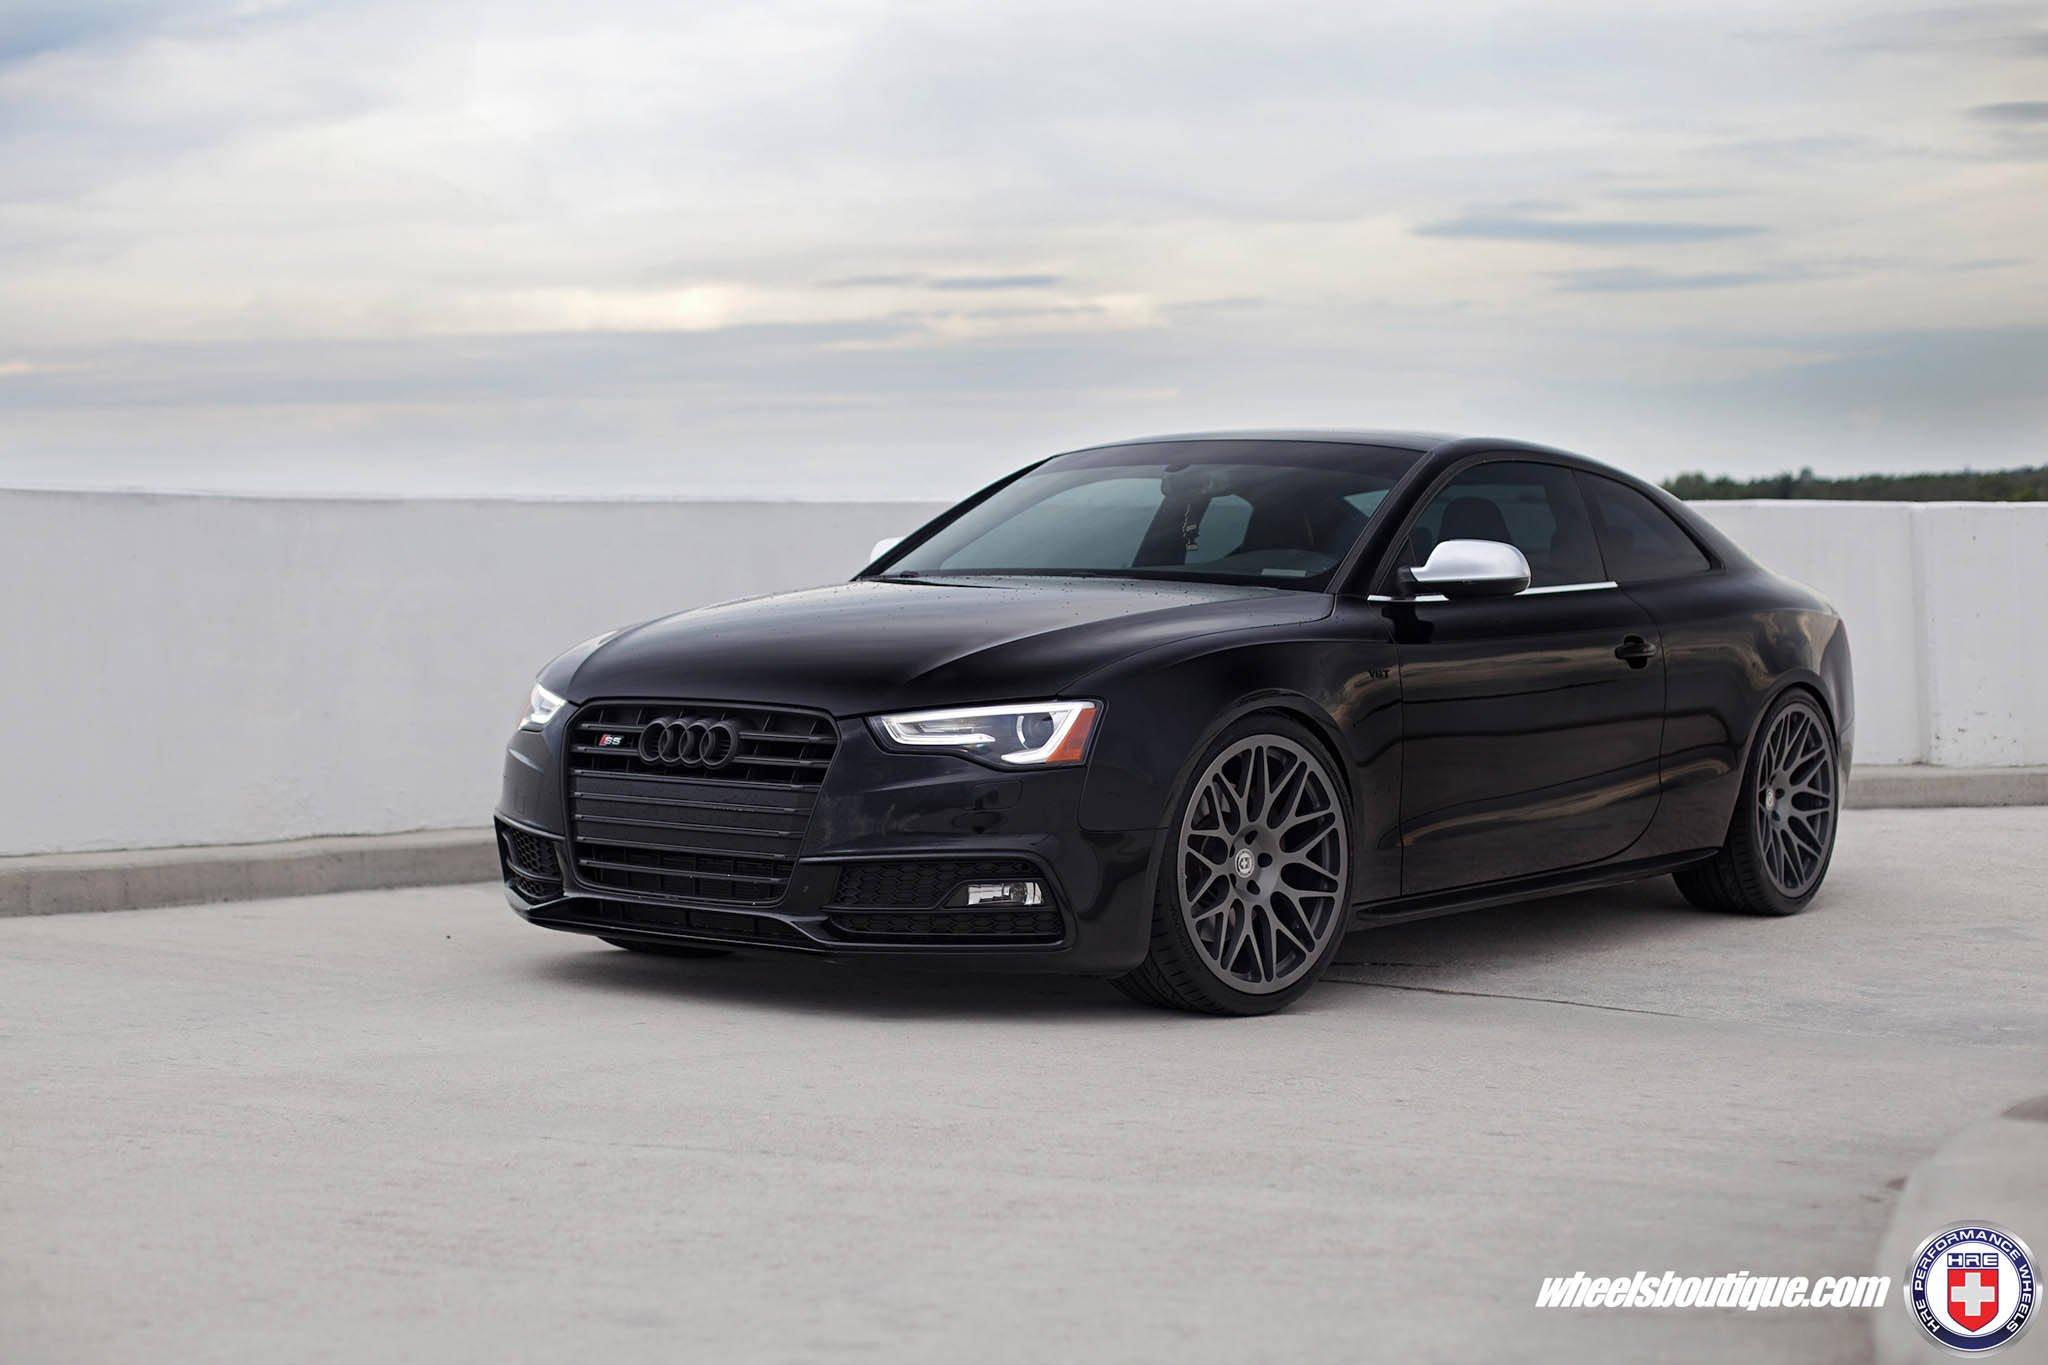 Audi S5 Coupe Black Hre Wheels Wallpaper 2048x1365